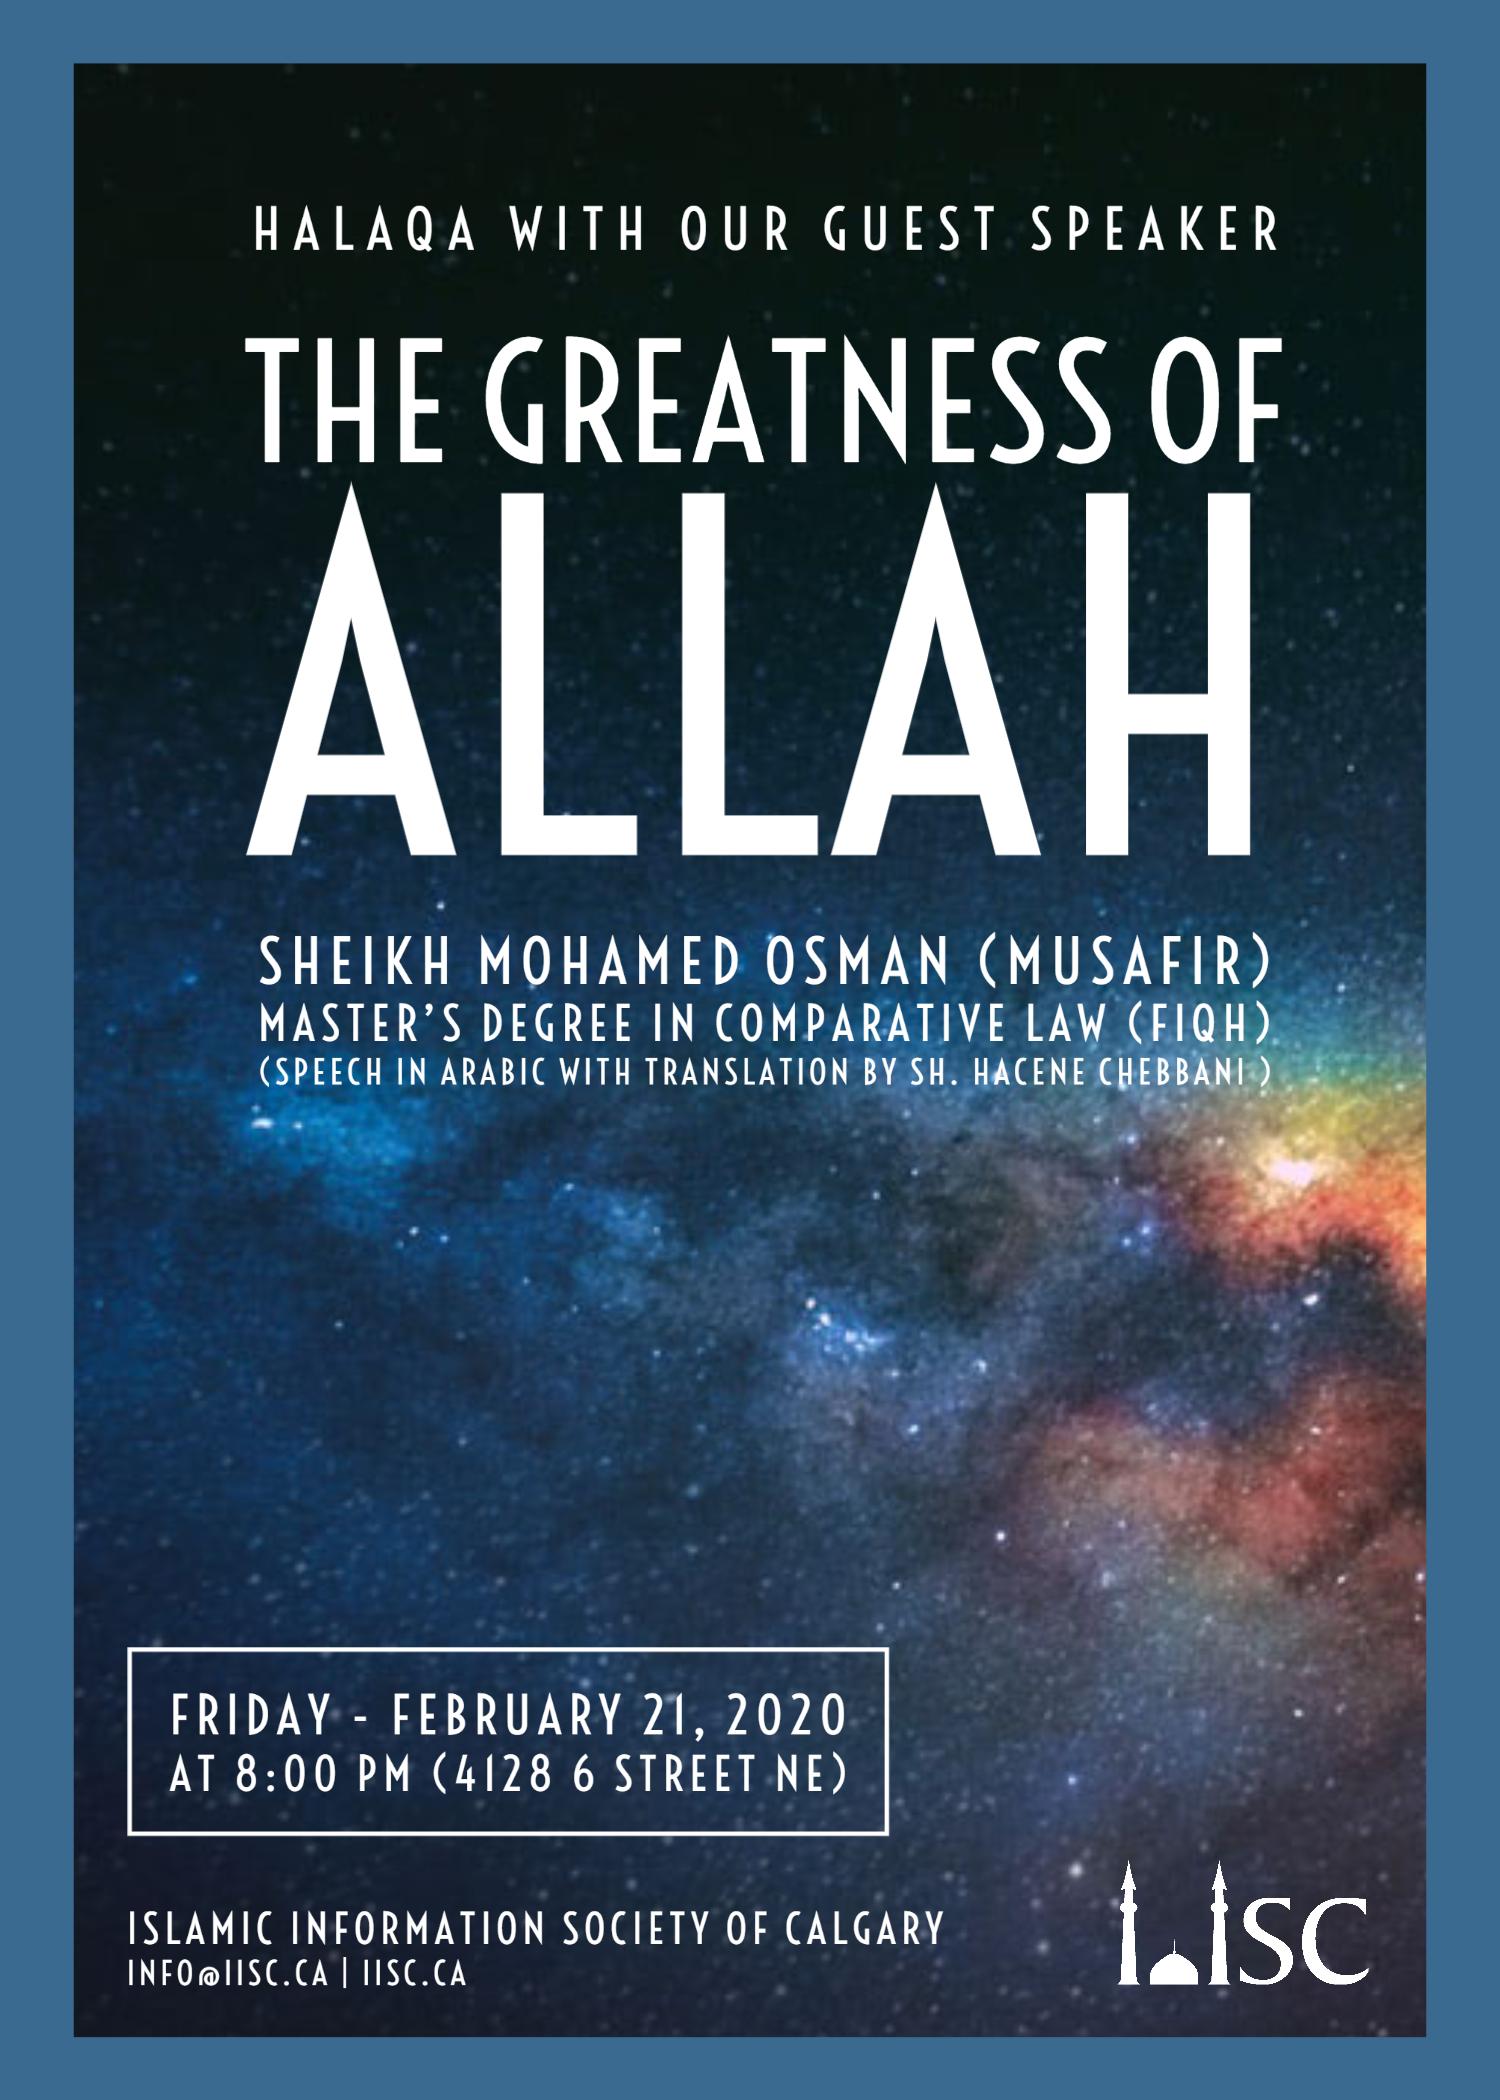 The Greatness of Allah - Speaker: Sheikh Mohamed Osman (Musafir) (Speech in  Arabic with translation of Sh. Hacene Chebbani)